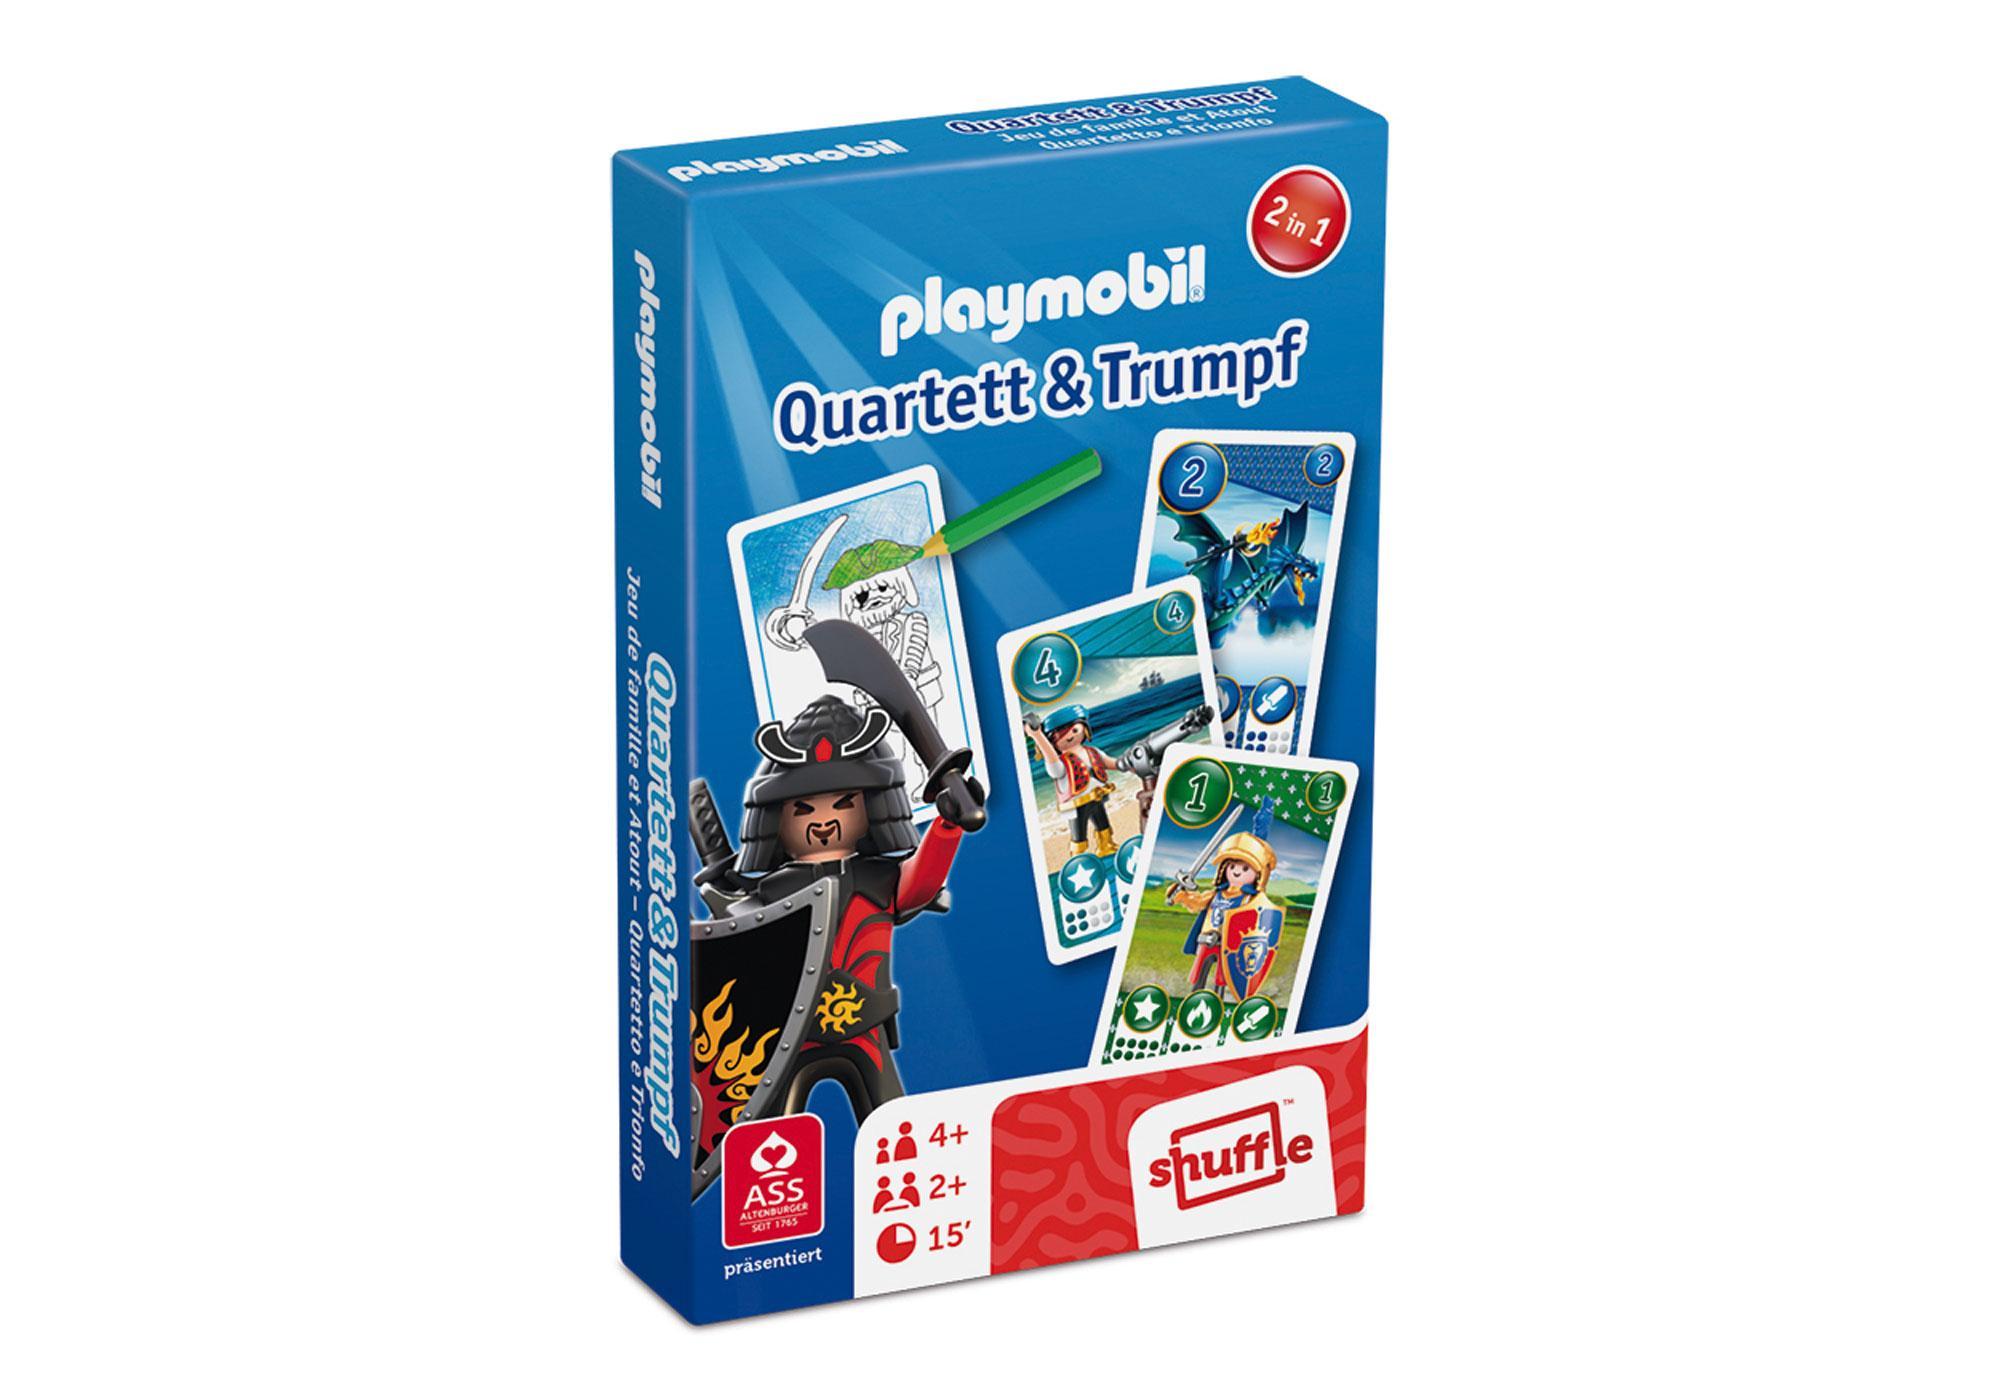 http://media.playmobil.com/i/playmobil/80095_product_detail/Quartett&Trumpf Boys